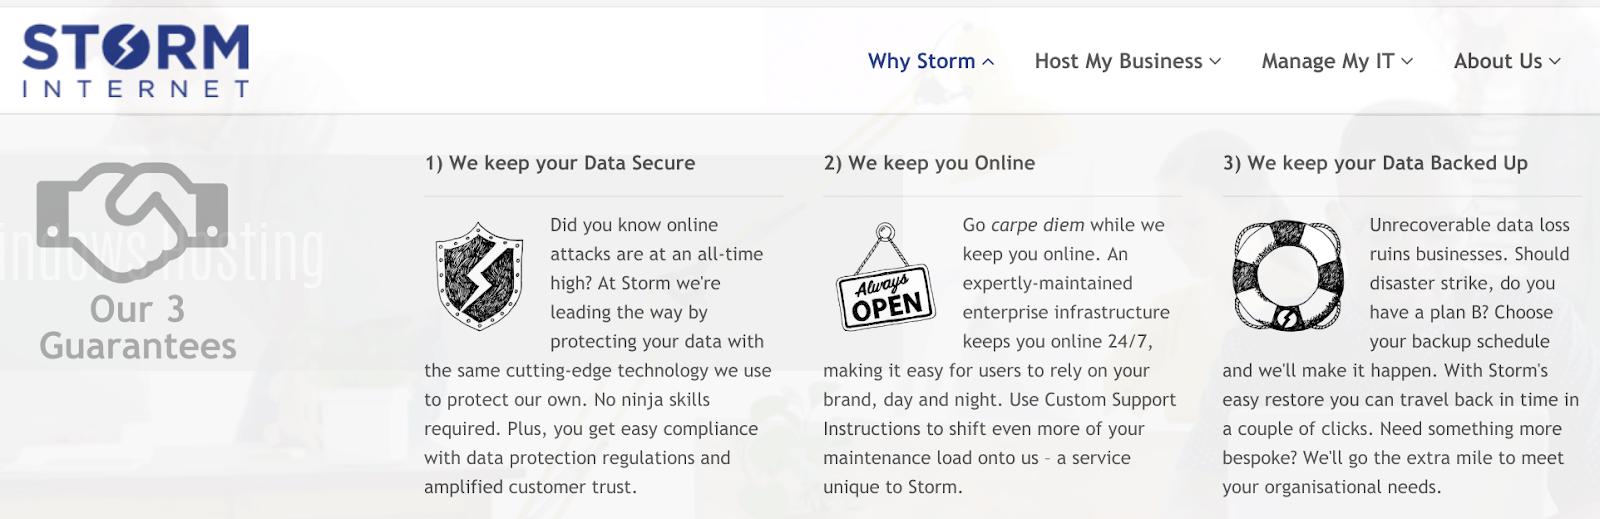 storminternet 1